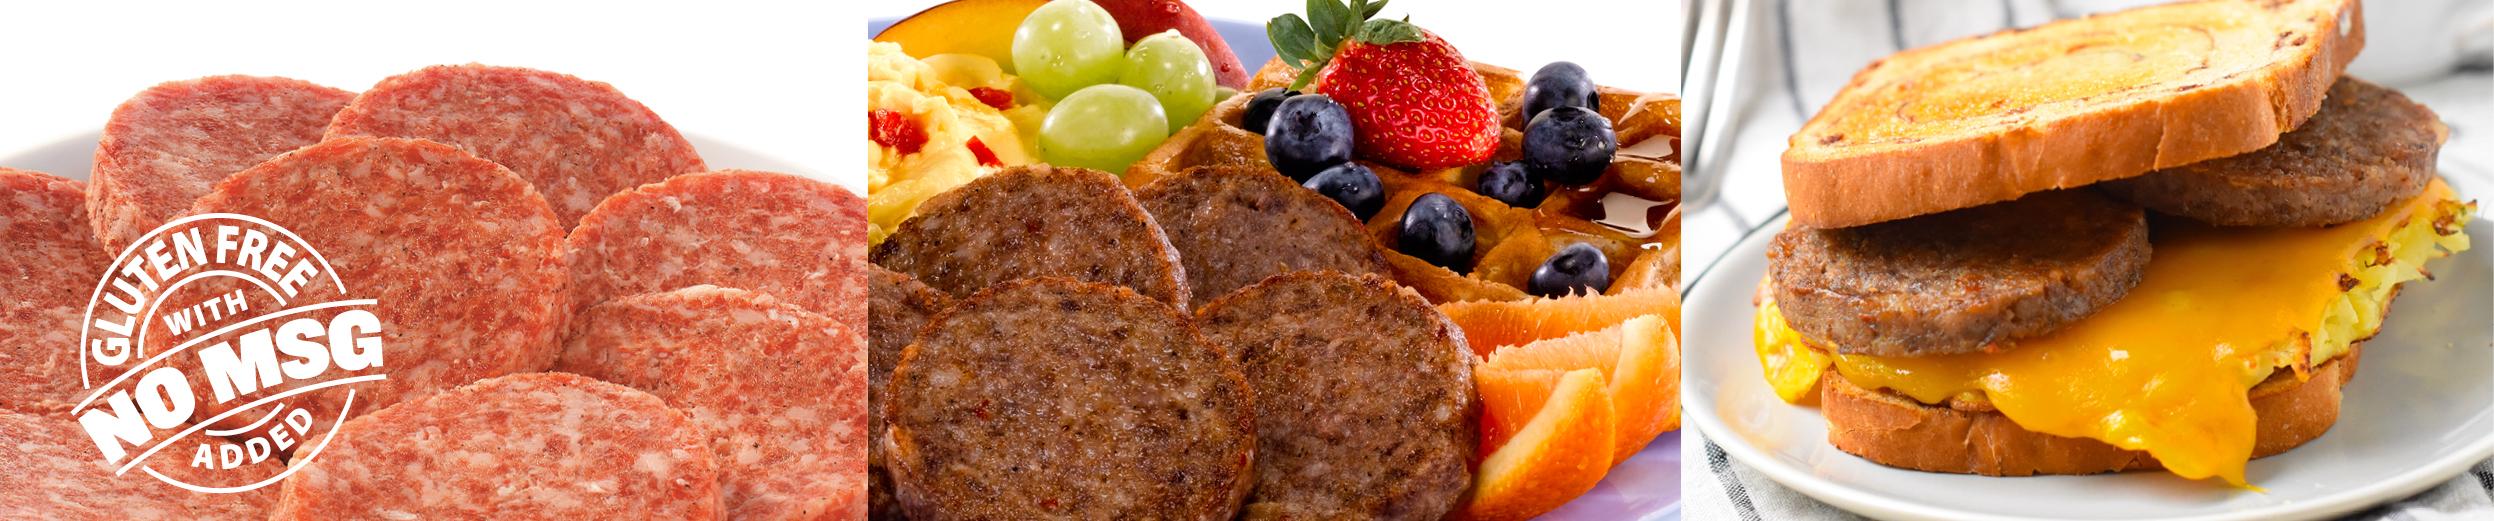 All Natural Premium Pork Sausage Patties